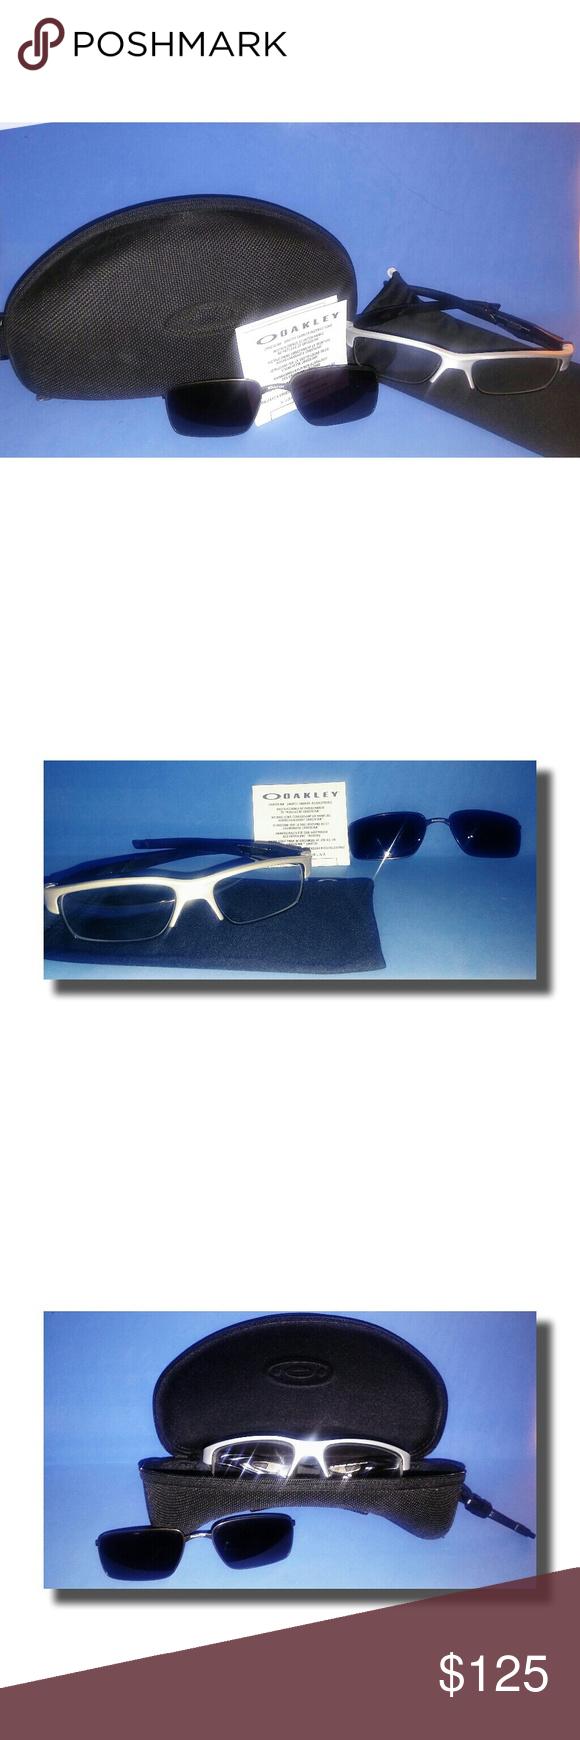 d5a251cbcb ... czech oakley crosslink switch rx glasses sun shades 6e5b1 a5cb2